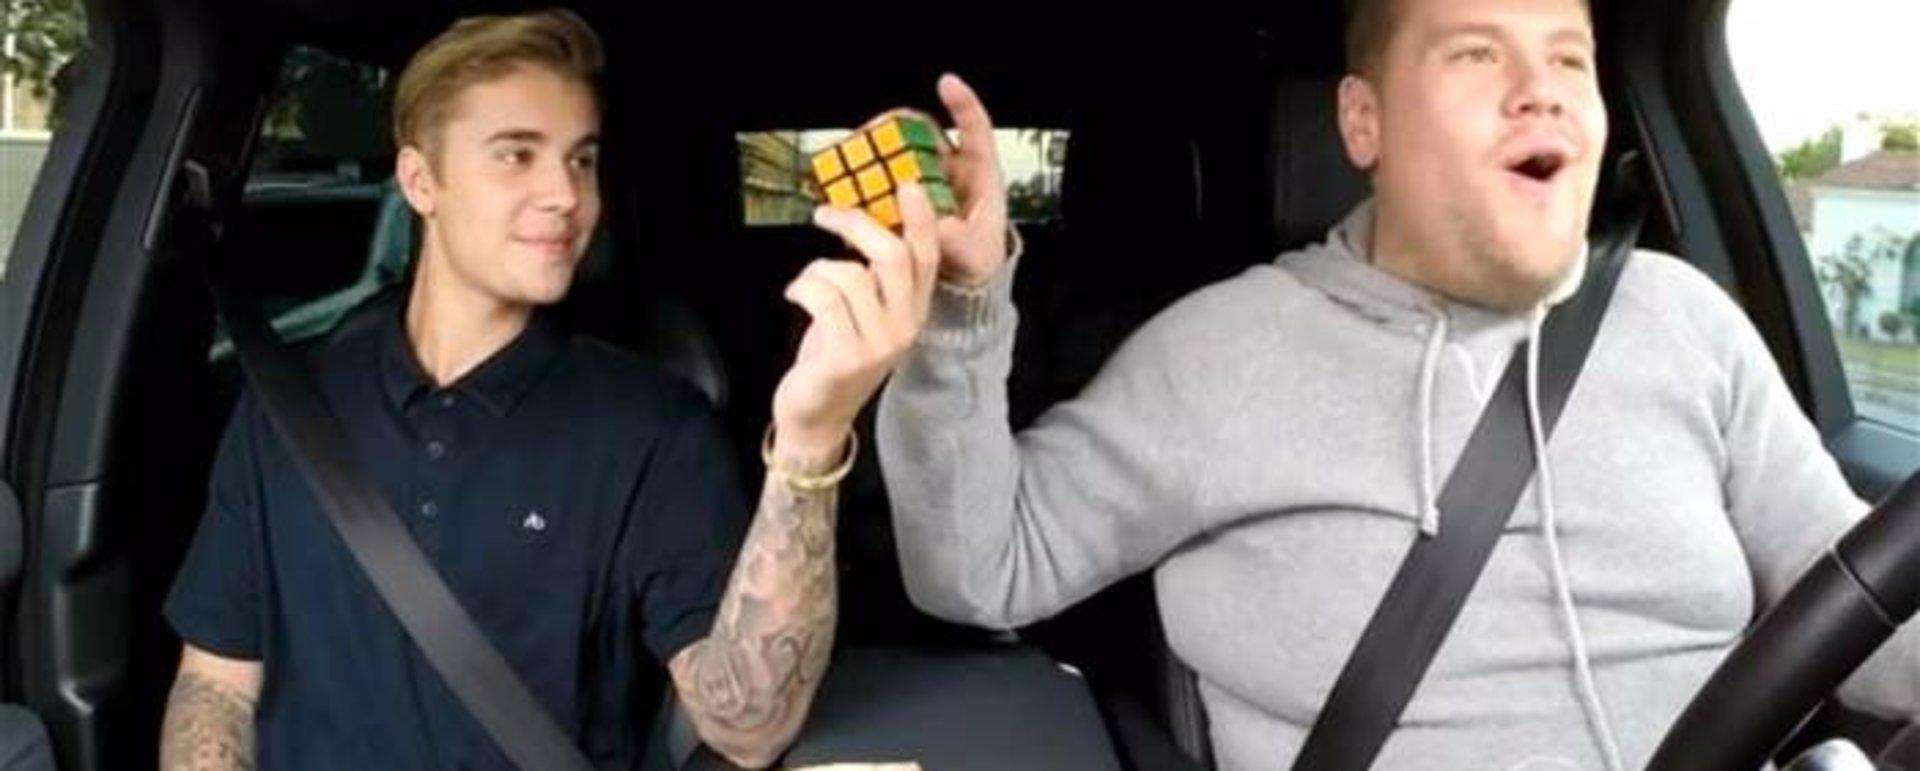 Carpool Karoke Justin Bieber Rubix Cube James Corden